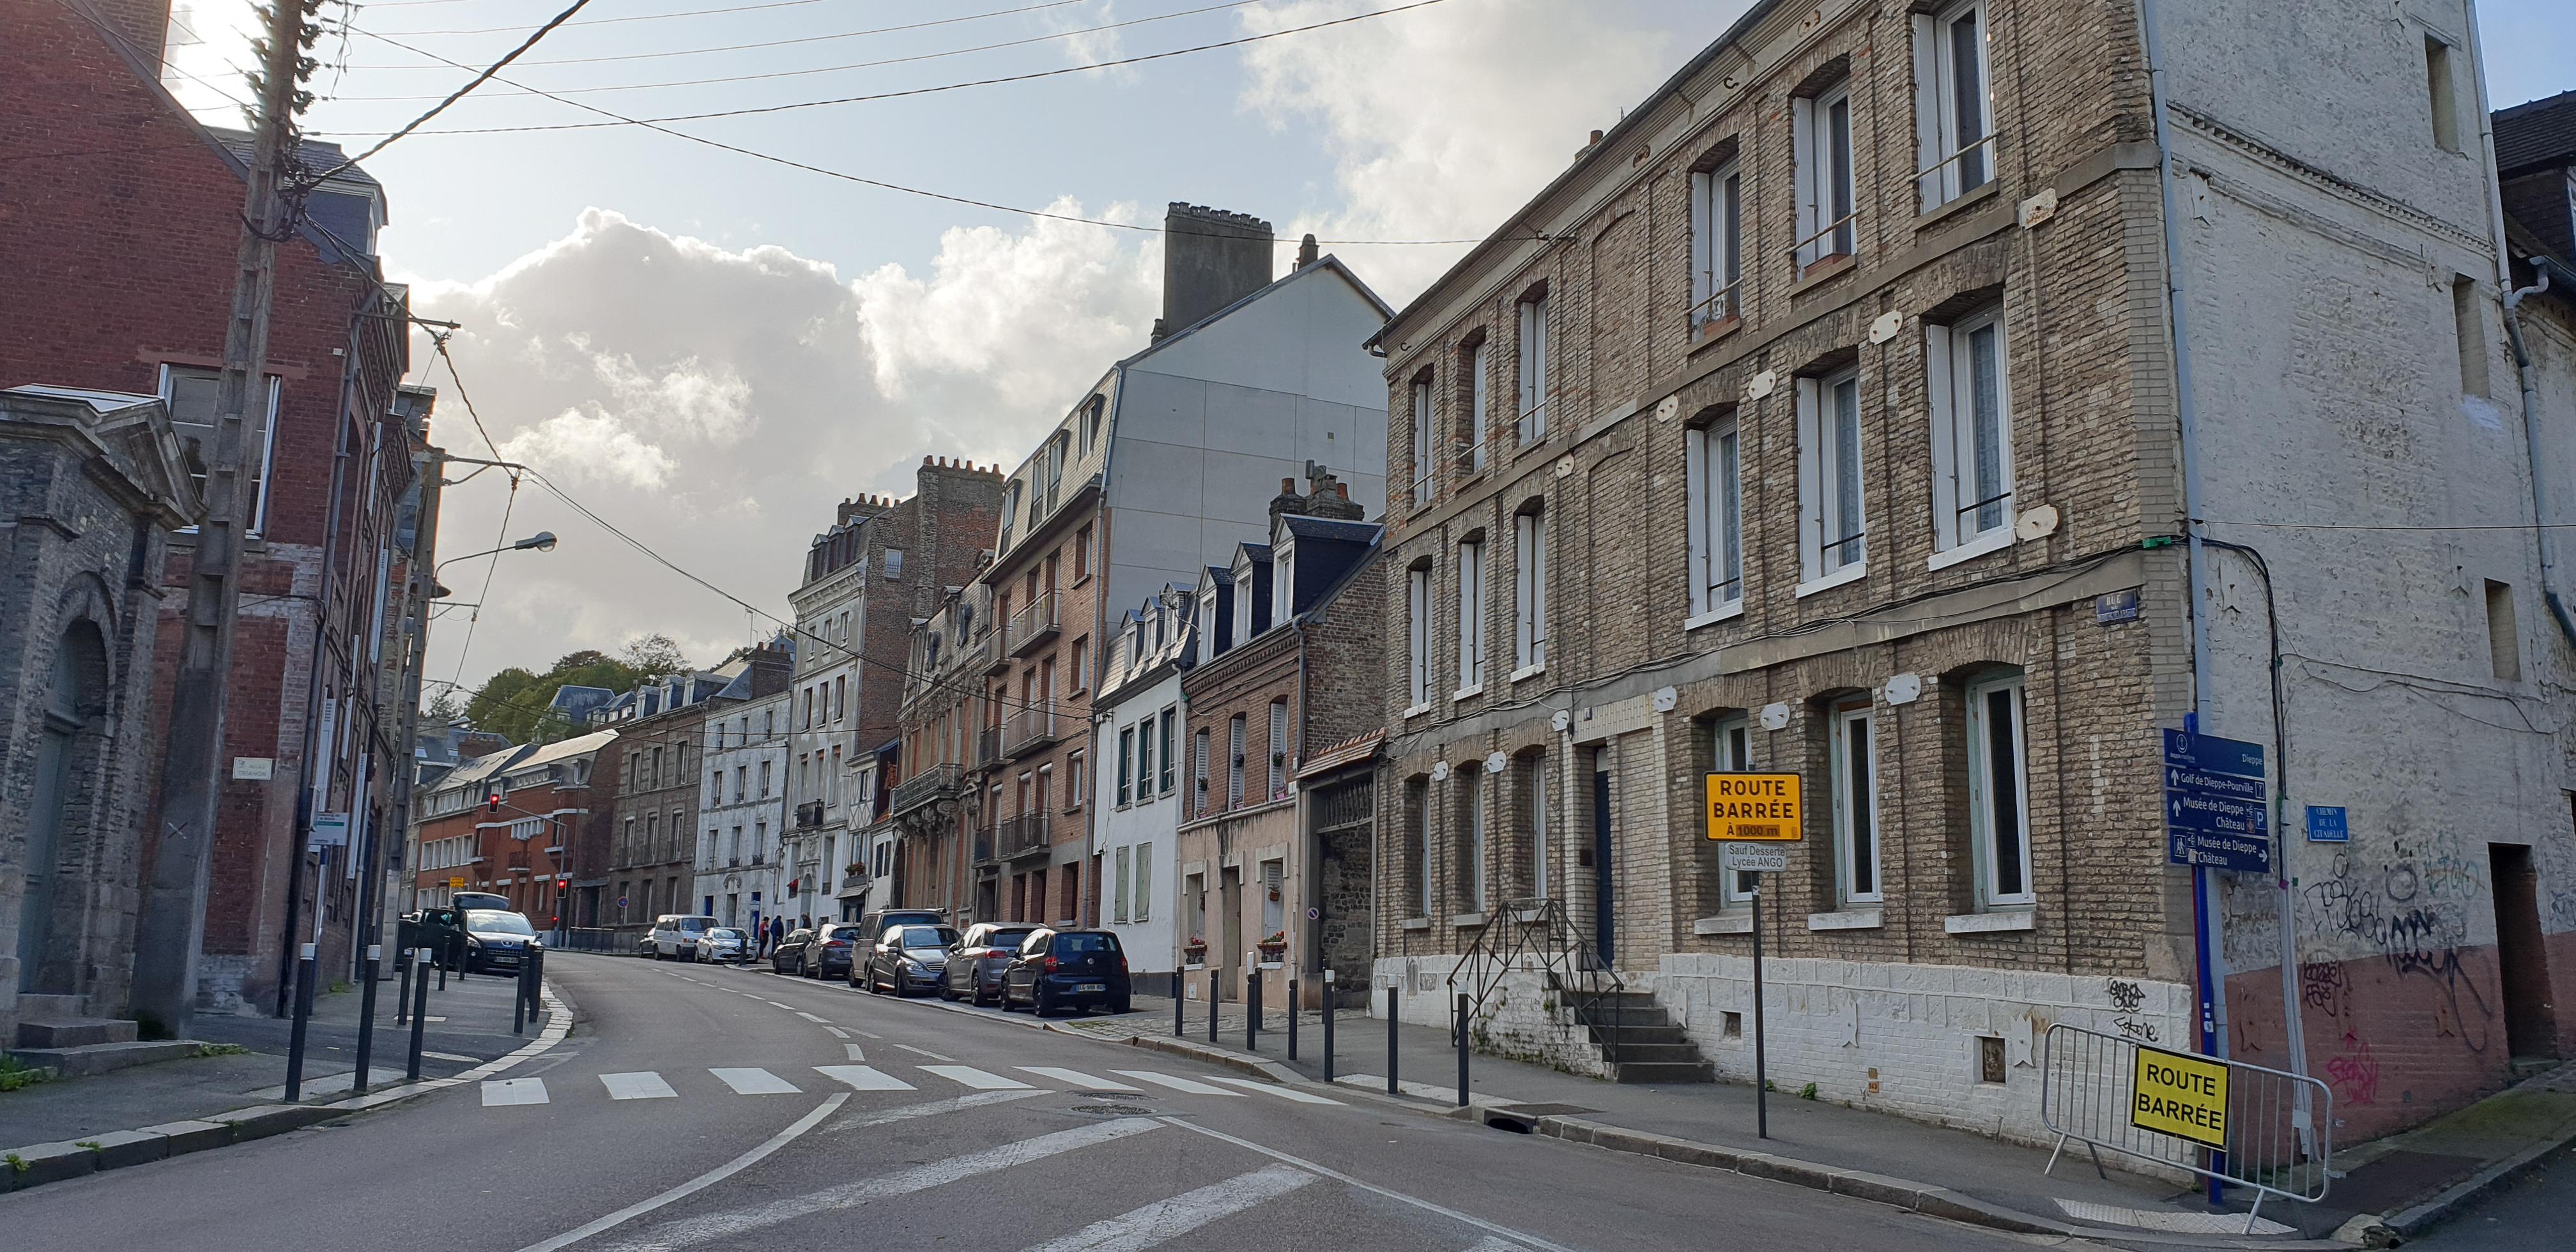 architektura normandzka w dieppe Normandia